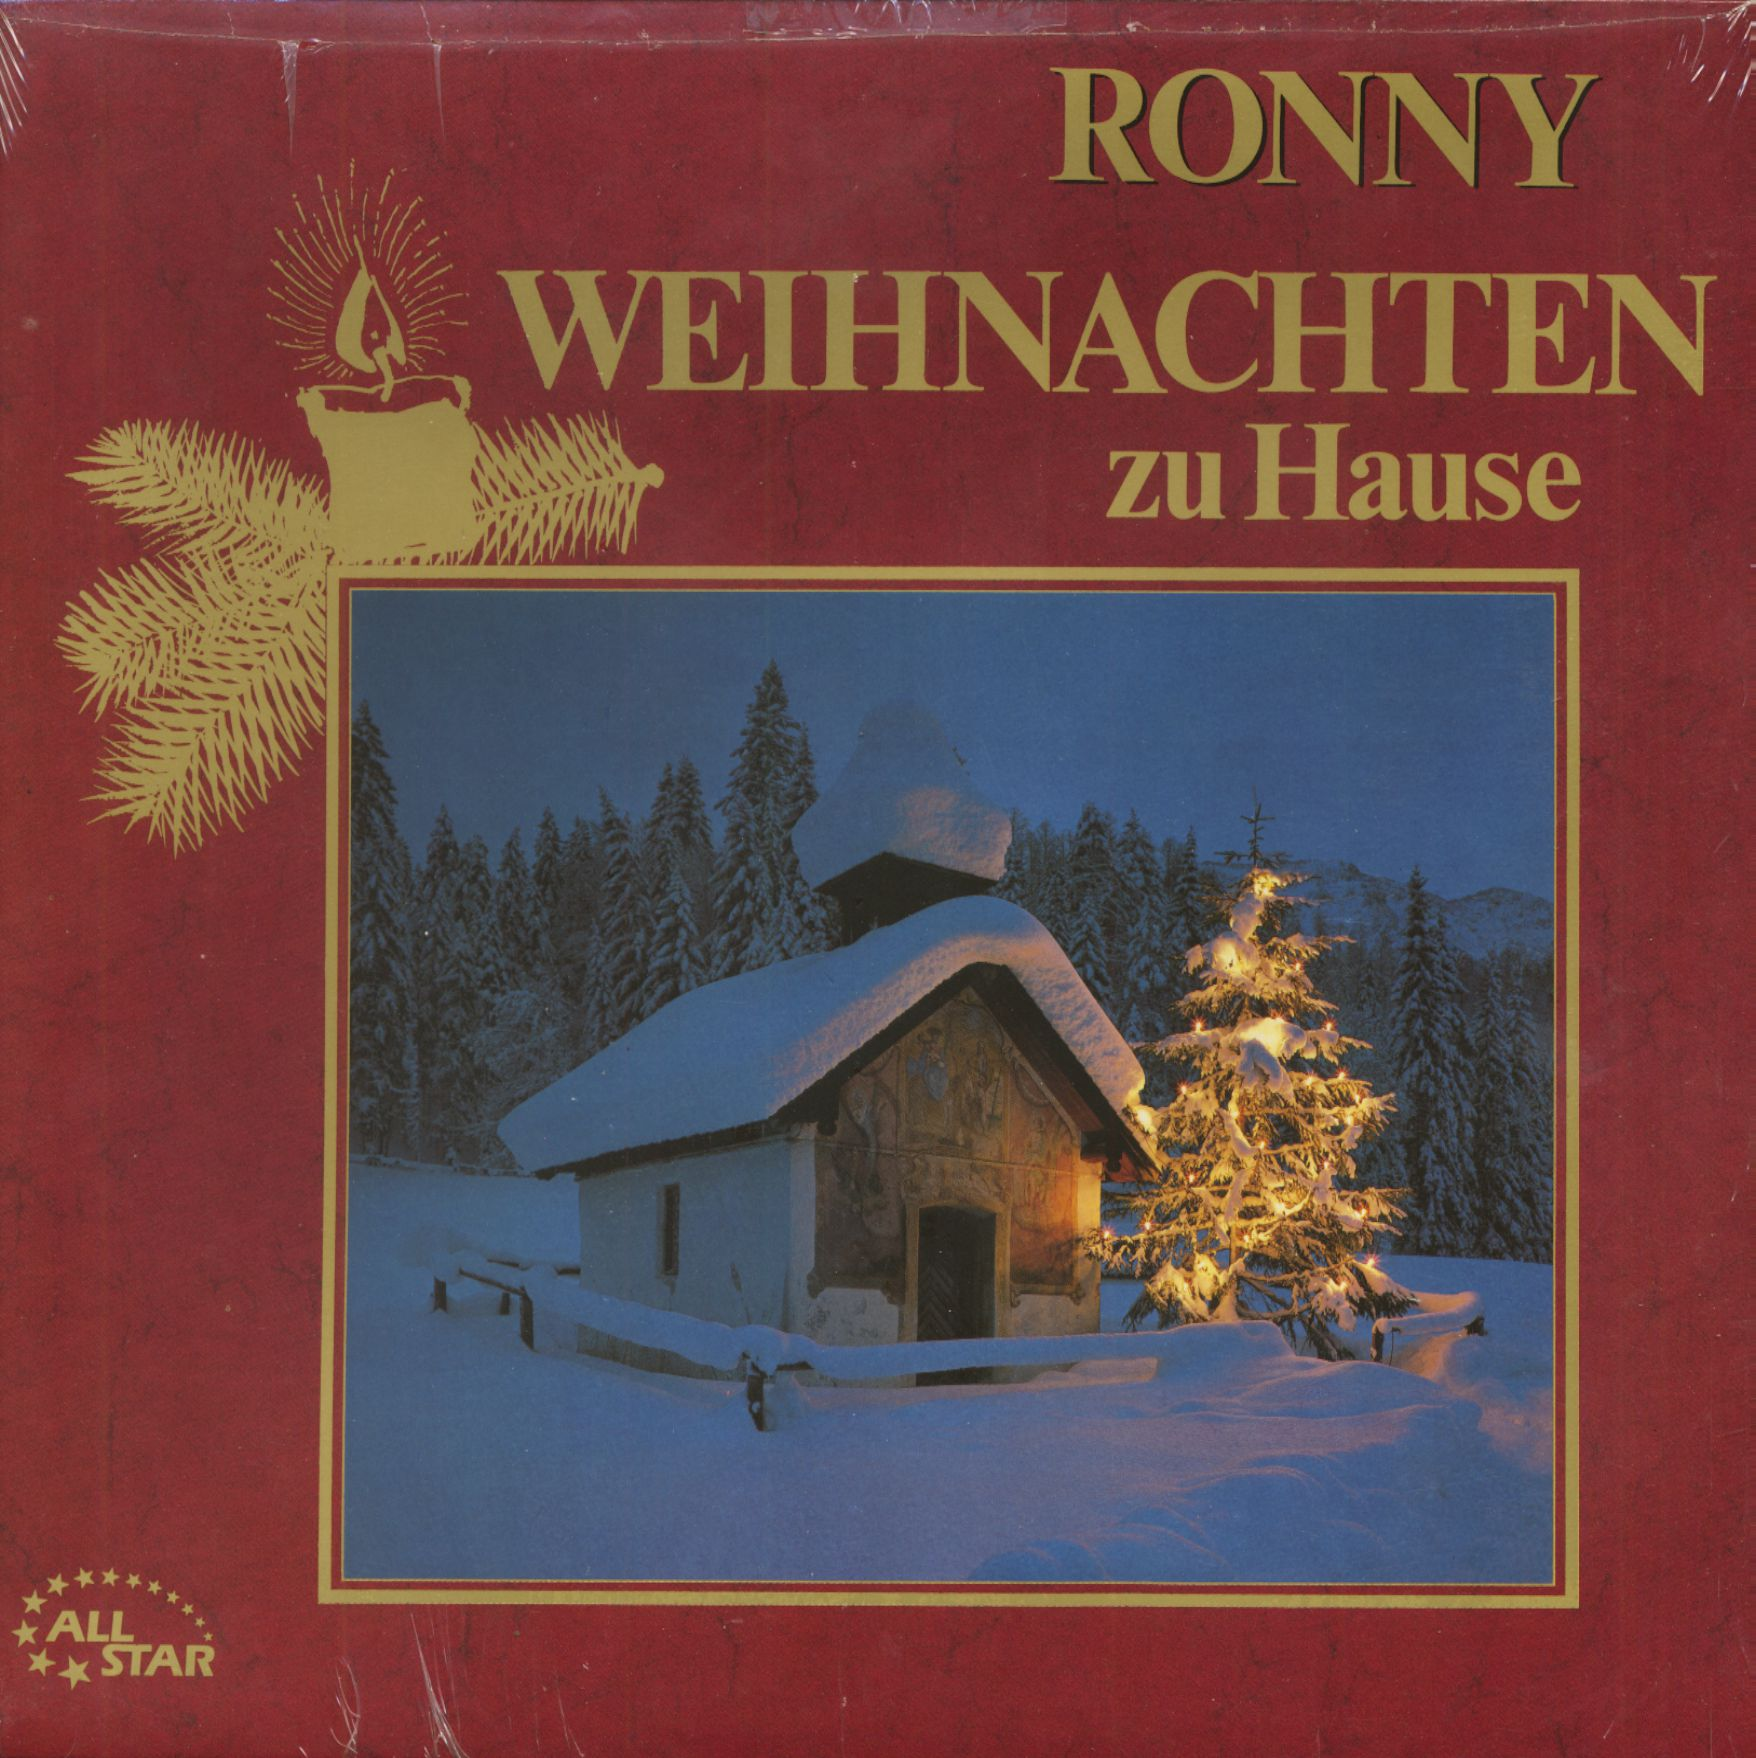 ronny lp weihnachten zu hause lp bear family records. Black Bedroom Furniture Sets. Home Design Ideas